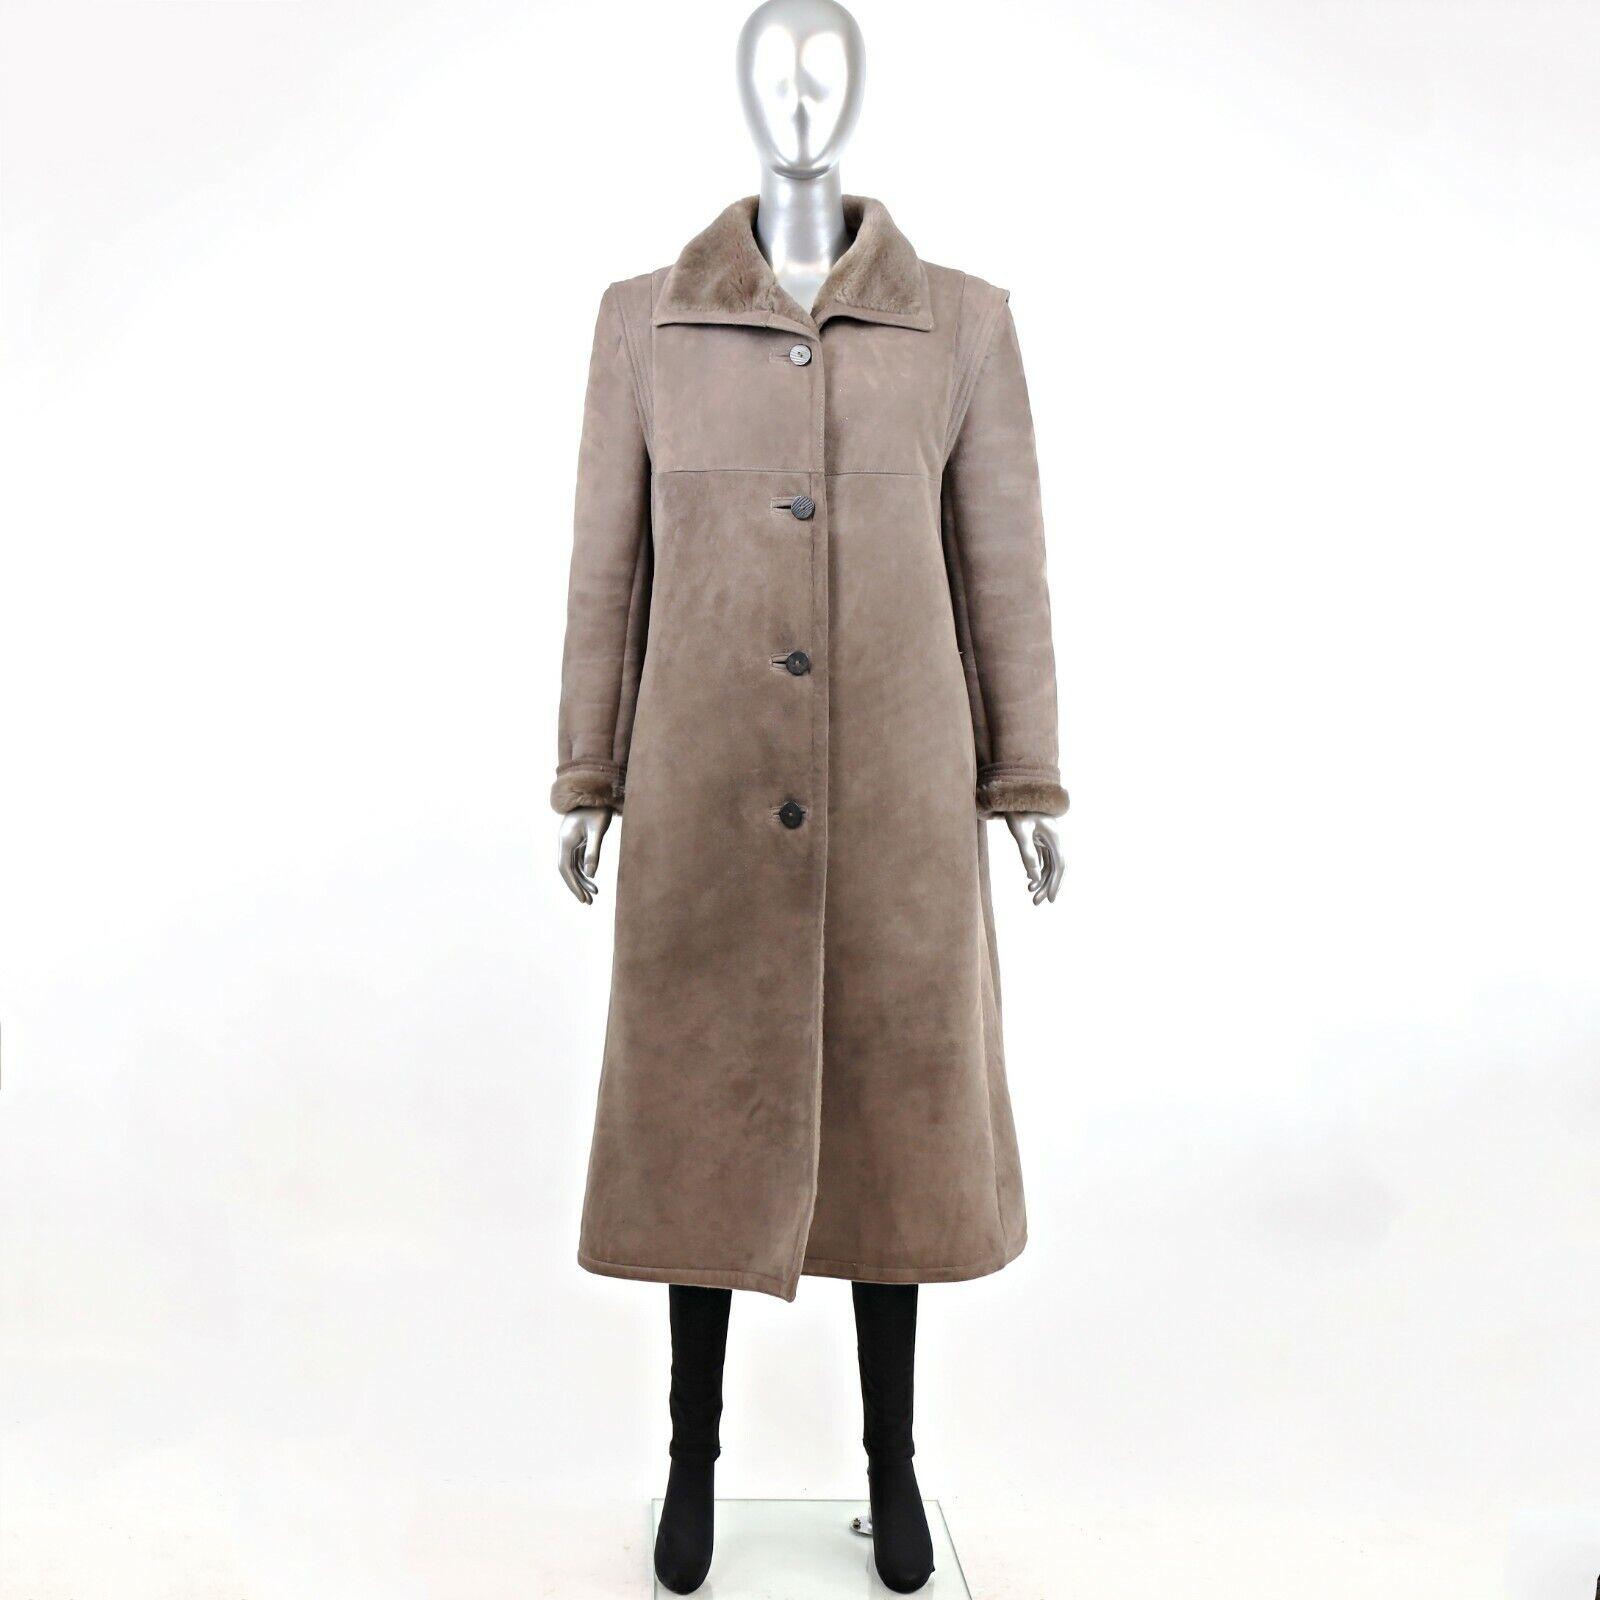 Full Length Shearling Coat- Size M-L (Vintage Fur… - image 3